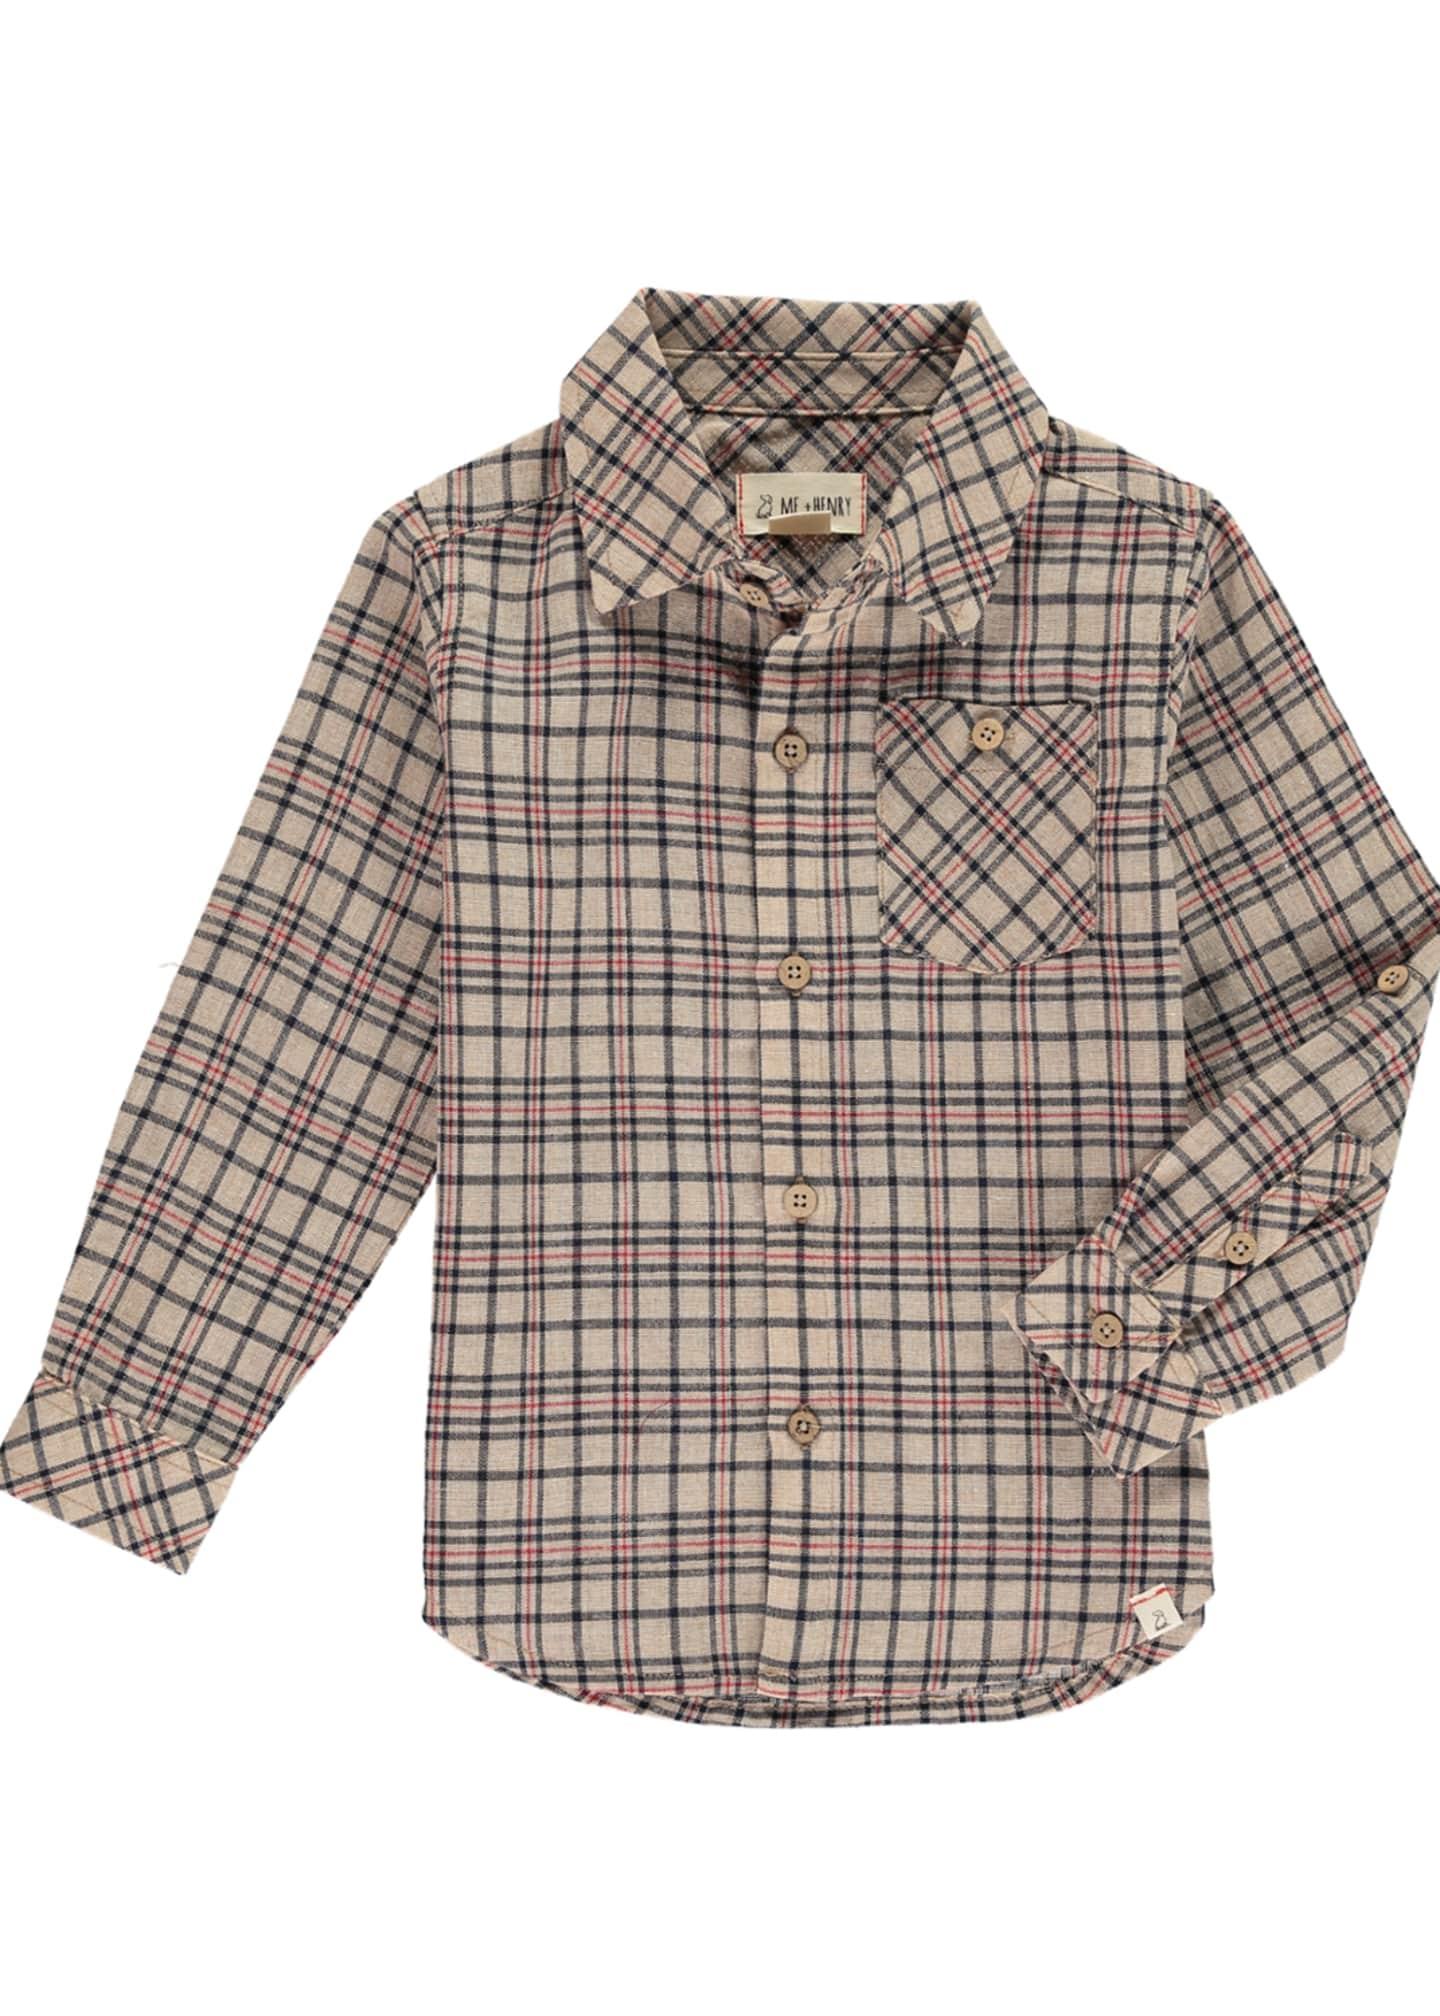 Me & Henry Boy's Woven Plaid Long-Sleeve Shirt